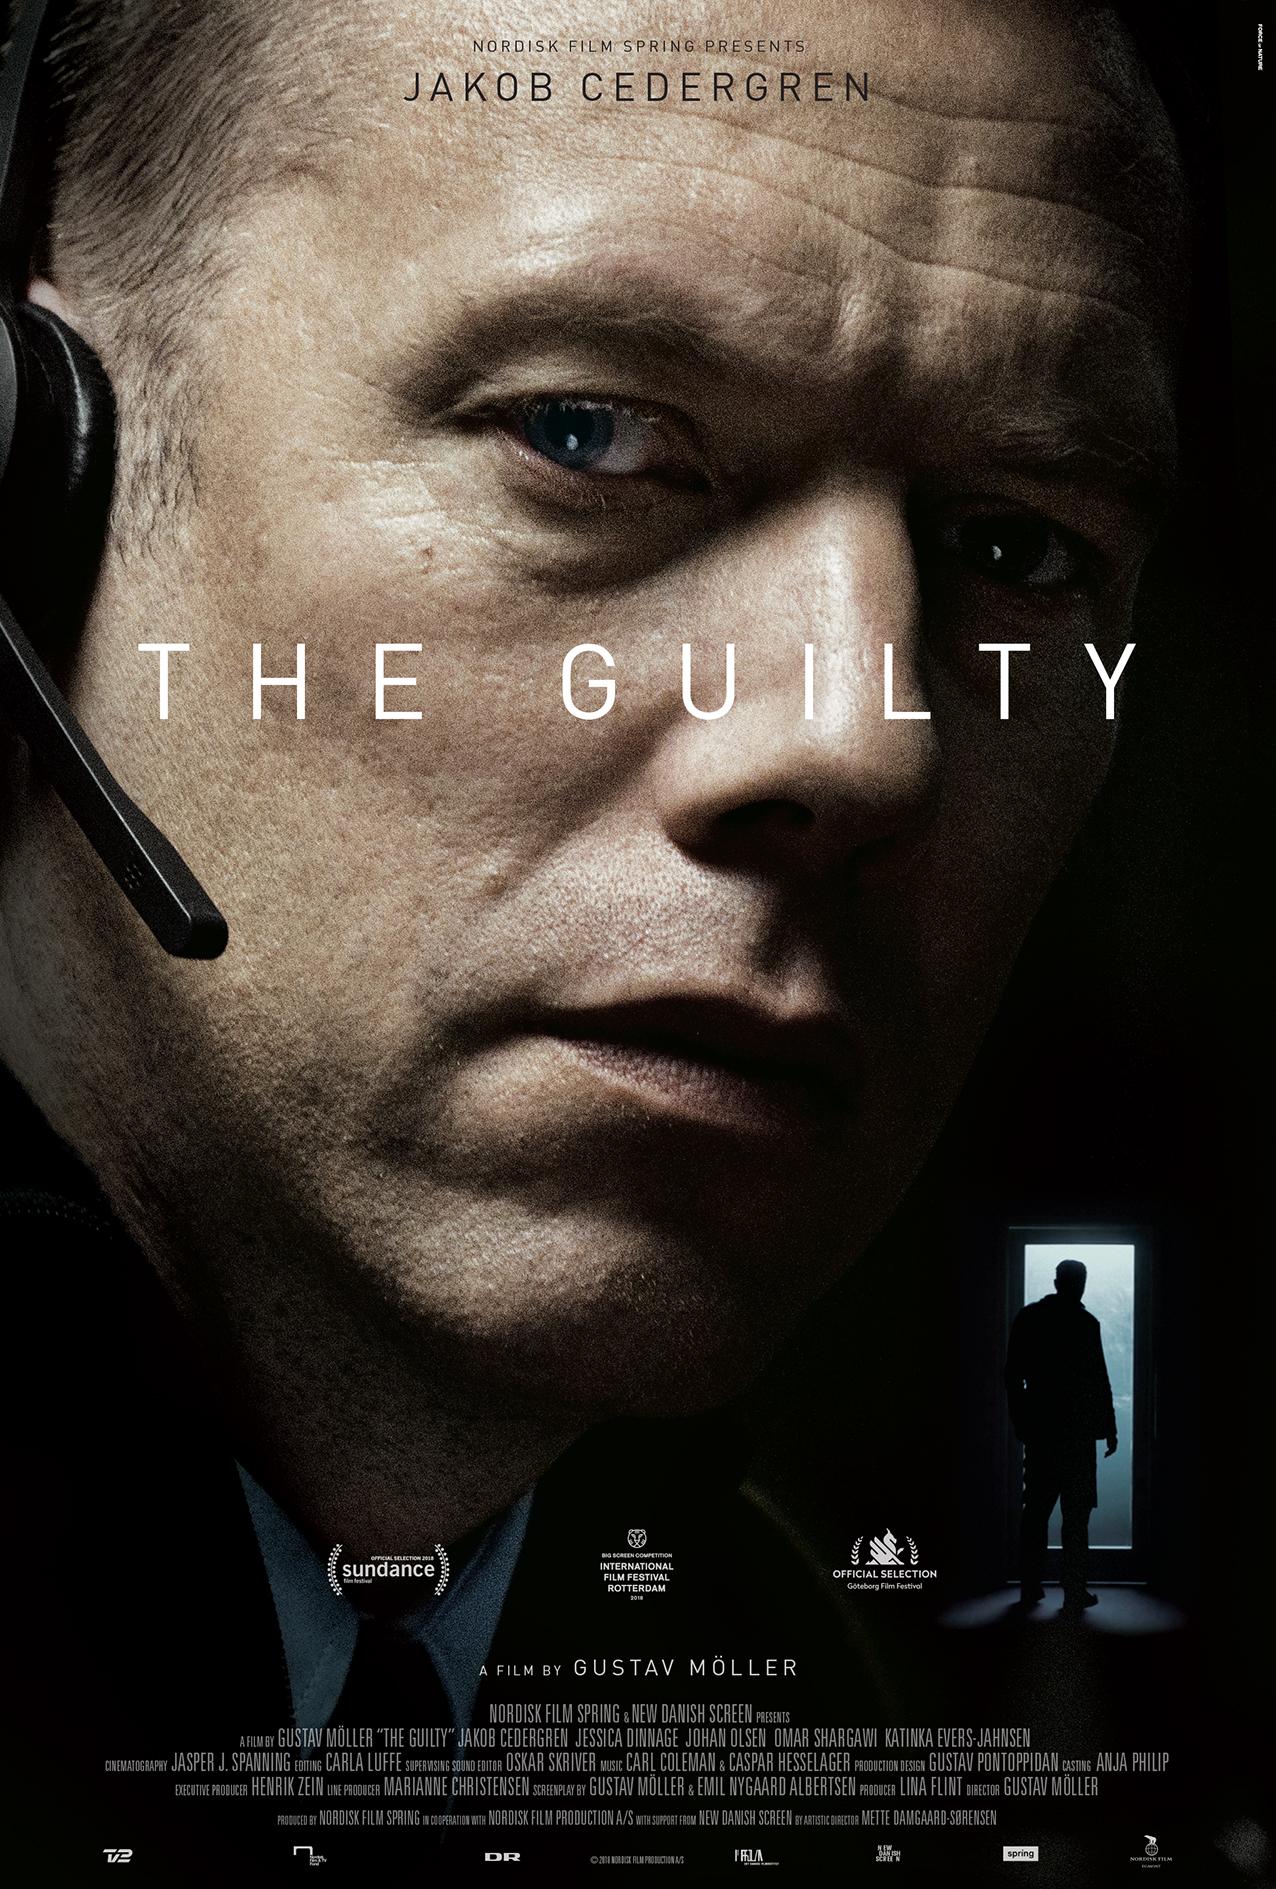 TheGuilty-poster.jpg